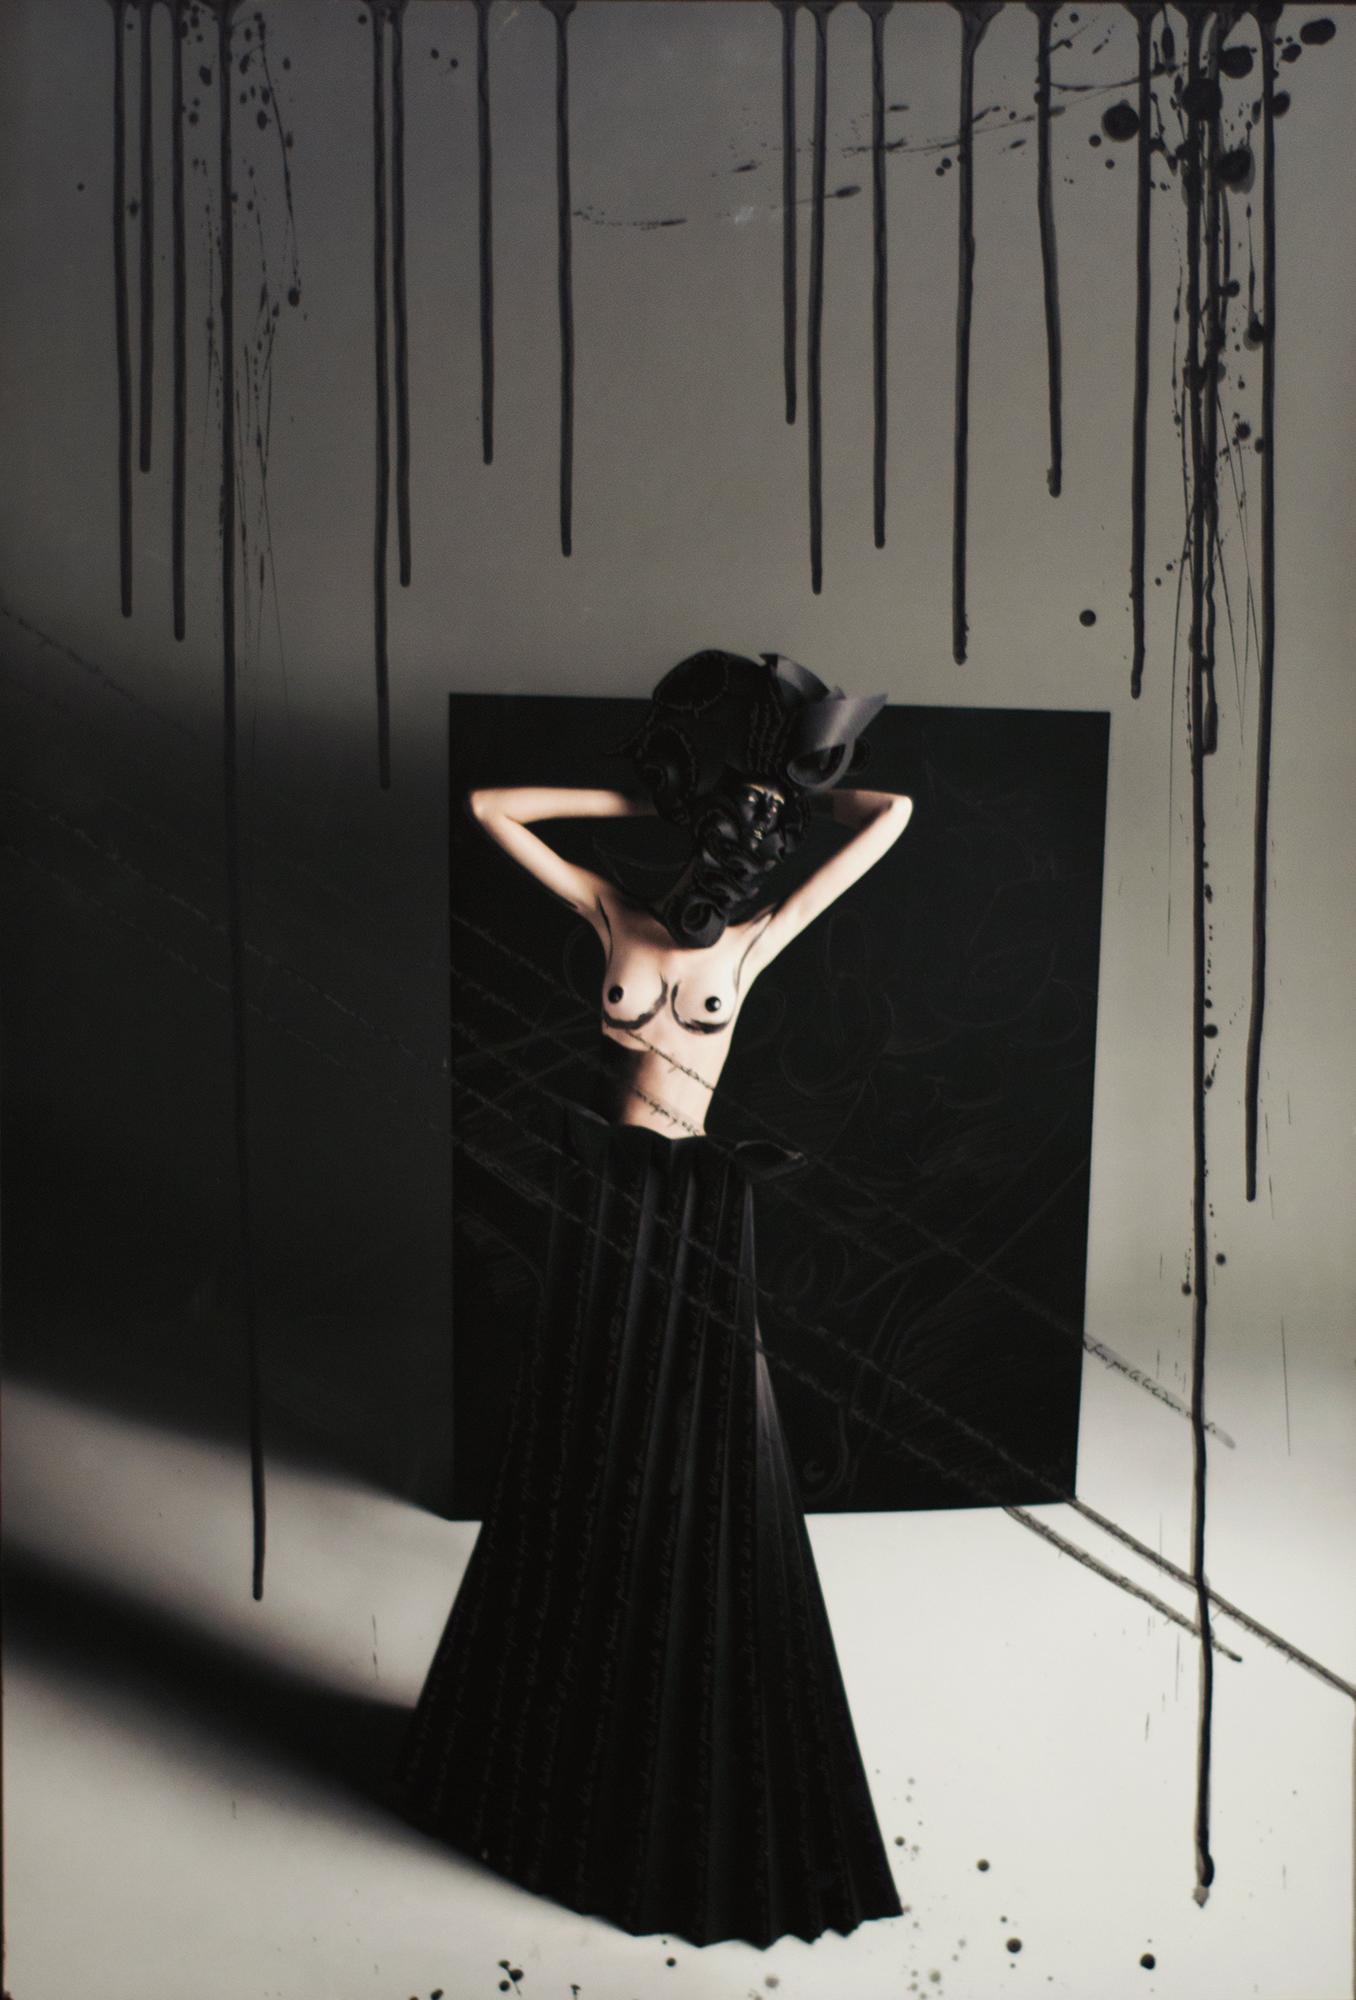 Teresa with Black Origami Skirt, 2010